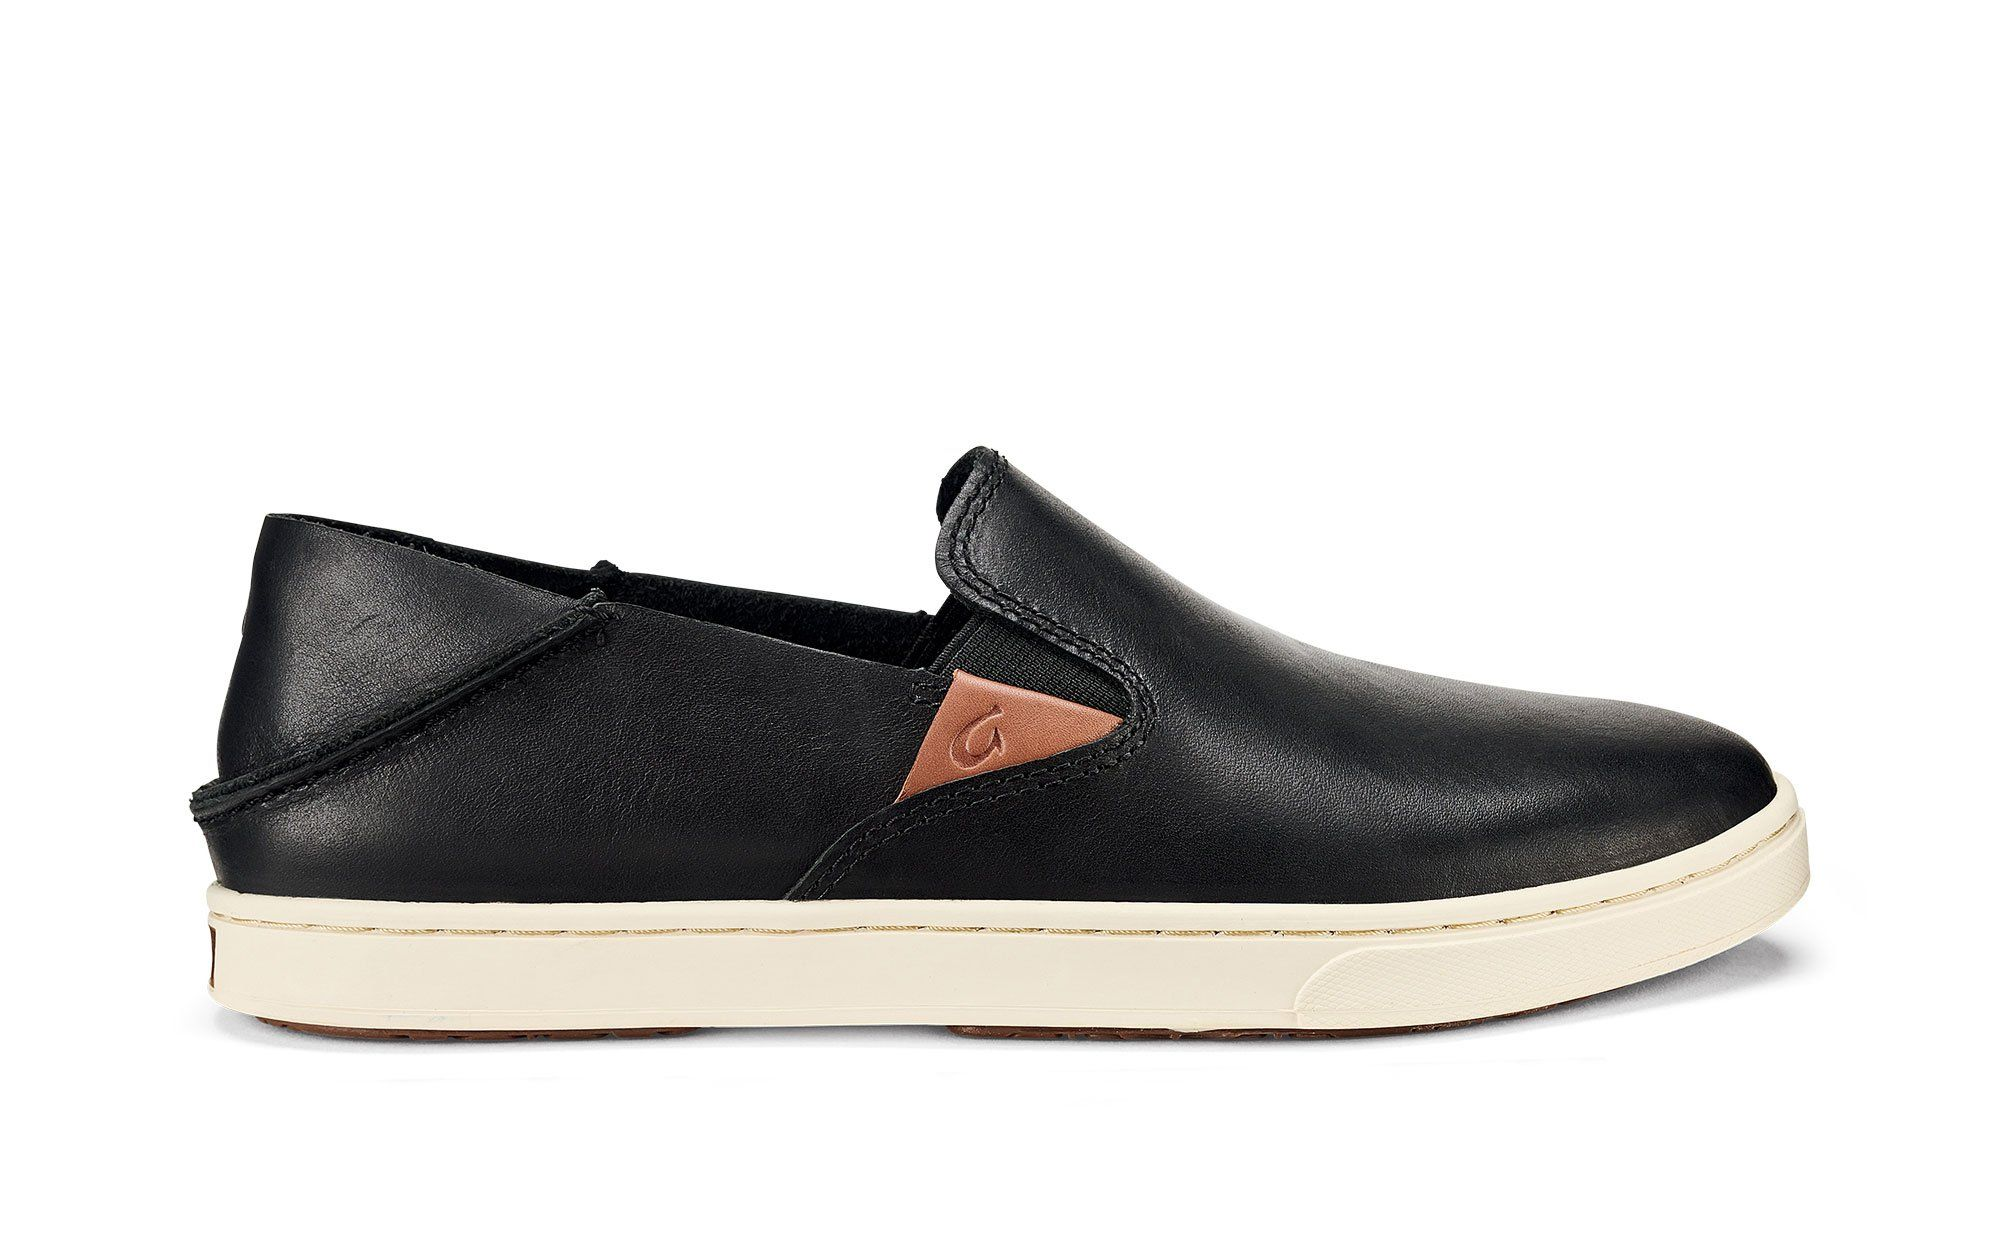 Olukai Pehuea Leather Black Women S Leather Sneakers In 2020 Leather Sneakers Women Leather Women Women Slip On Sneakers [ 1240 x 2000 Pixel ]